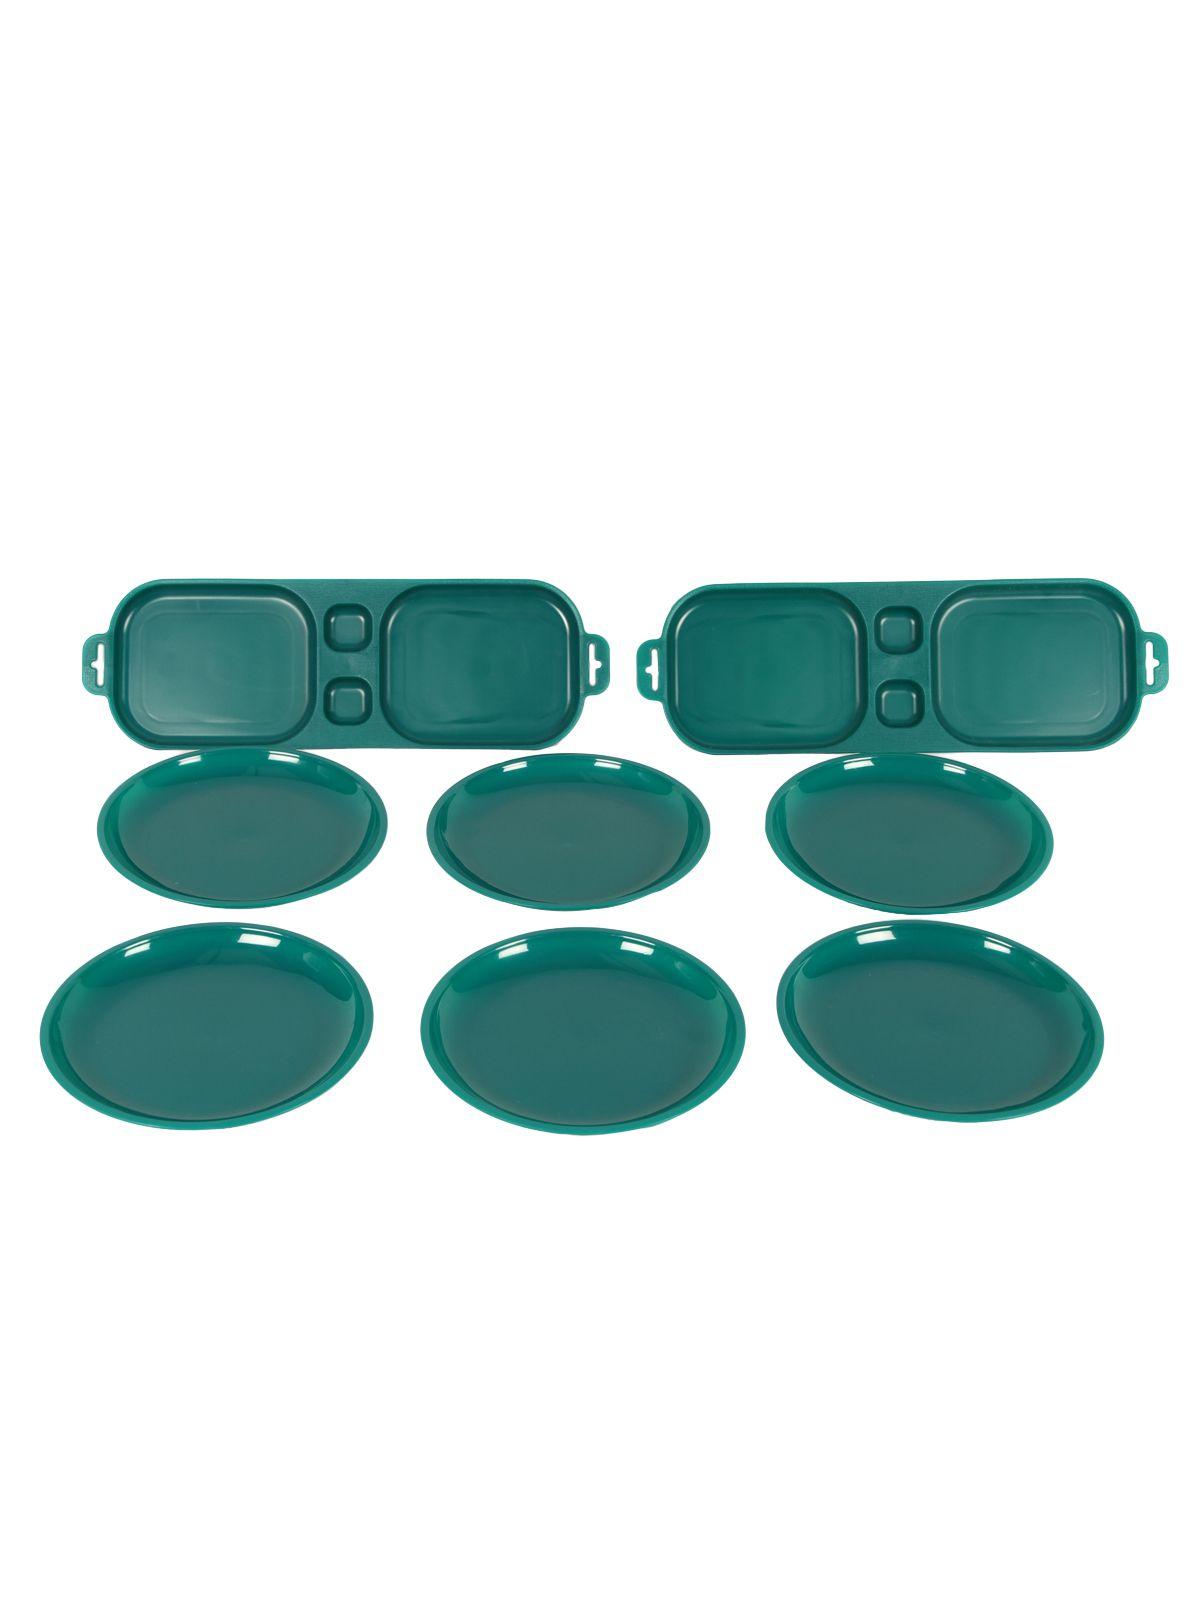 Cutting Edge Plastic Appetizer Snack Set (8 Pcs)